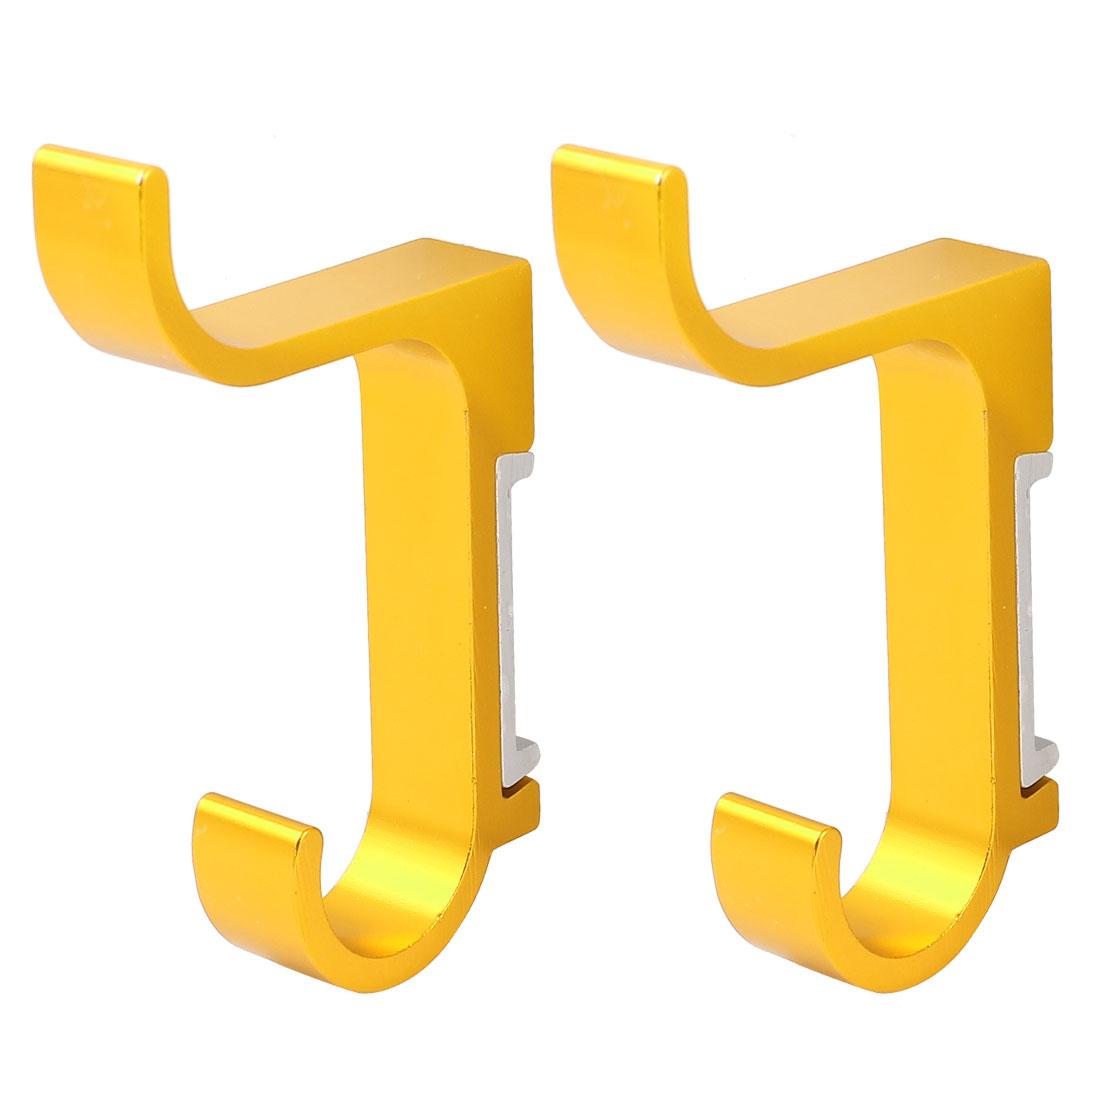 2 Pcs Aluminum Wall Mount Bathroom Towel Holder Robe Hooks Hanger Gold Tone 85mm